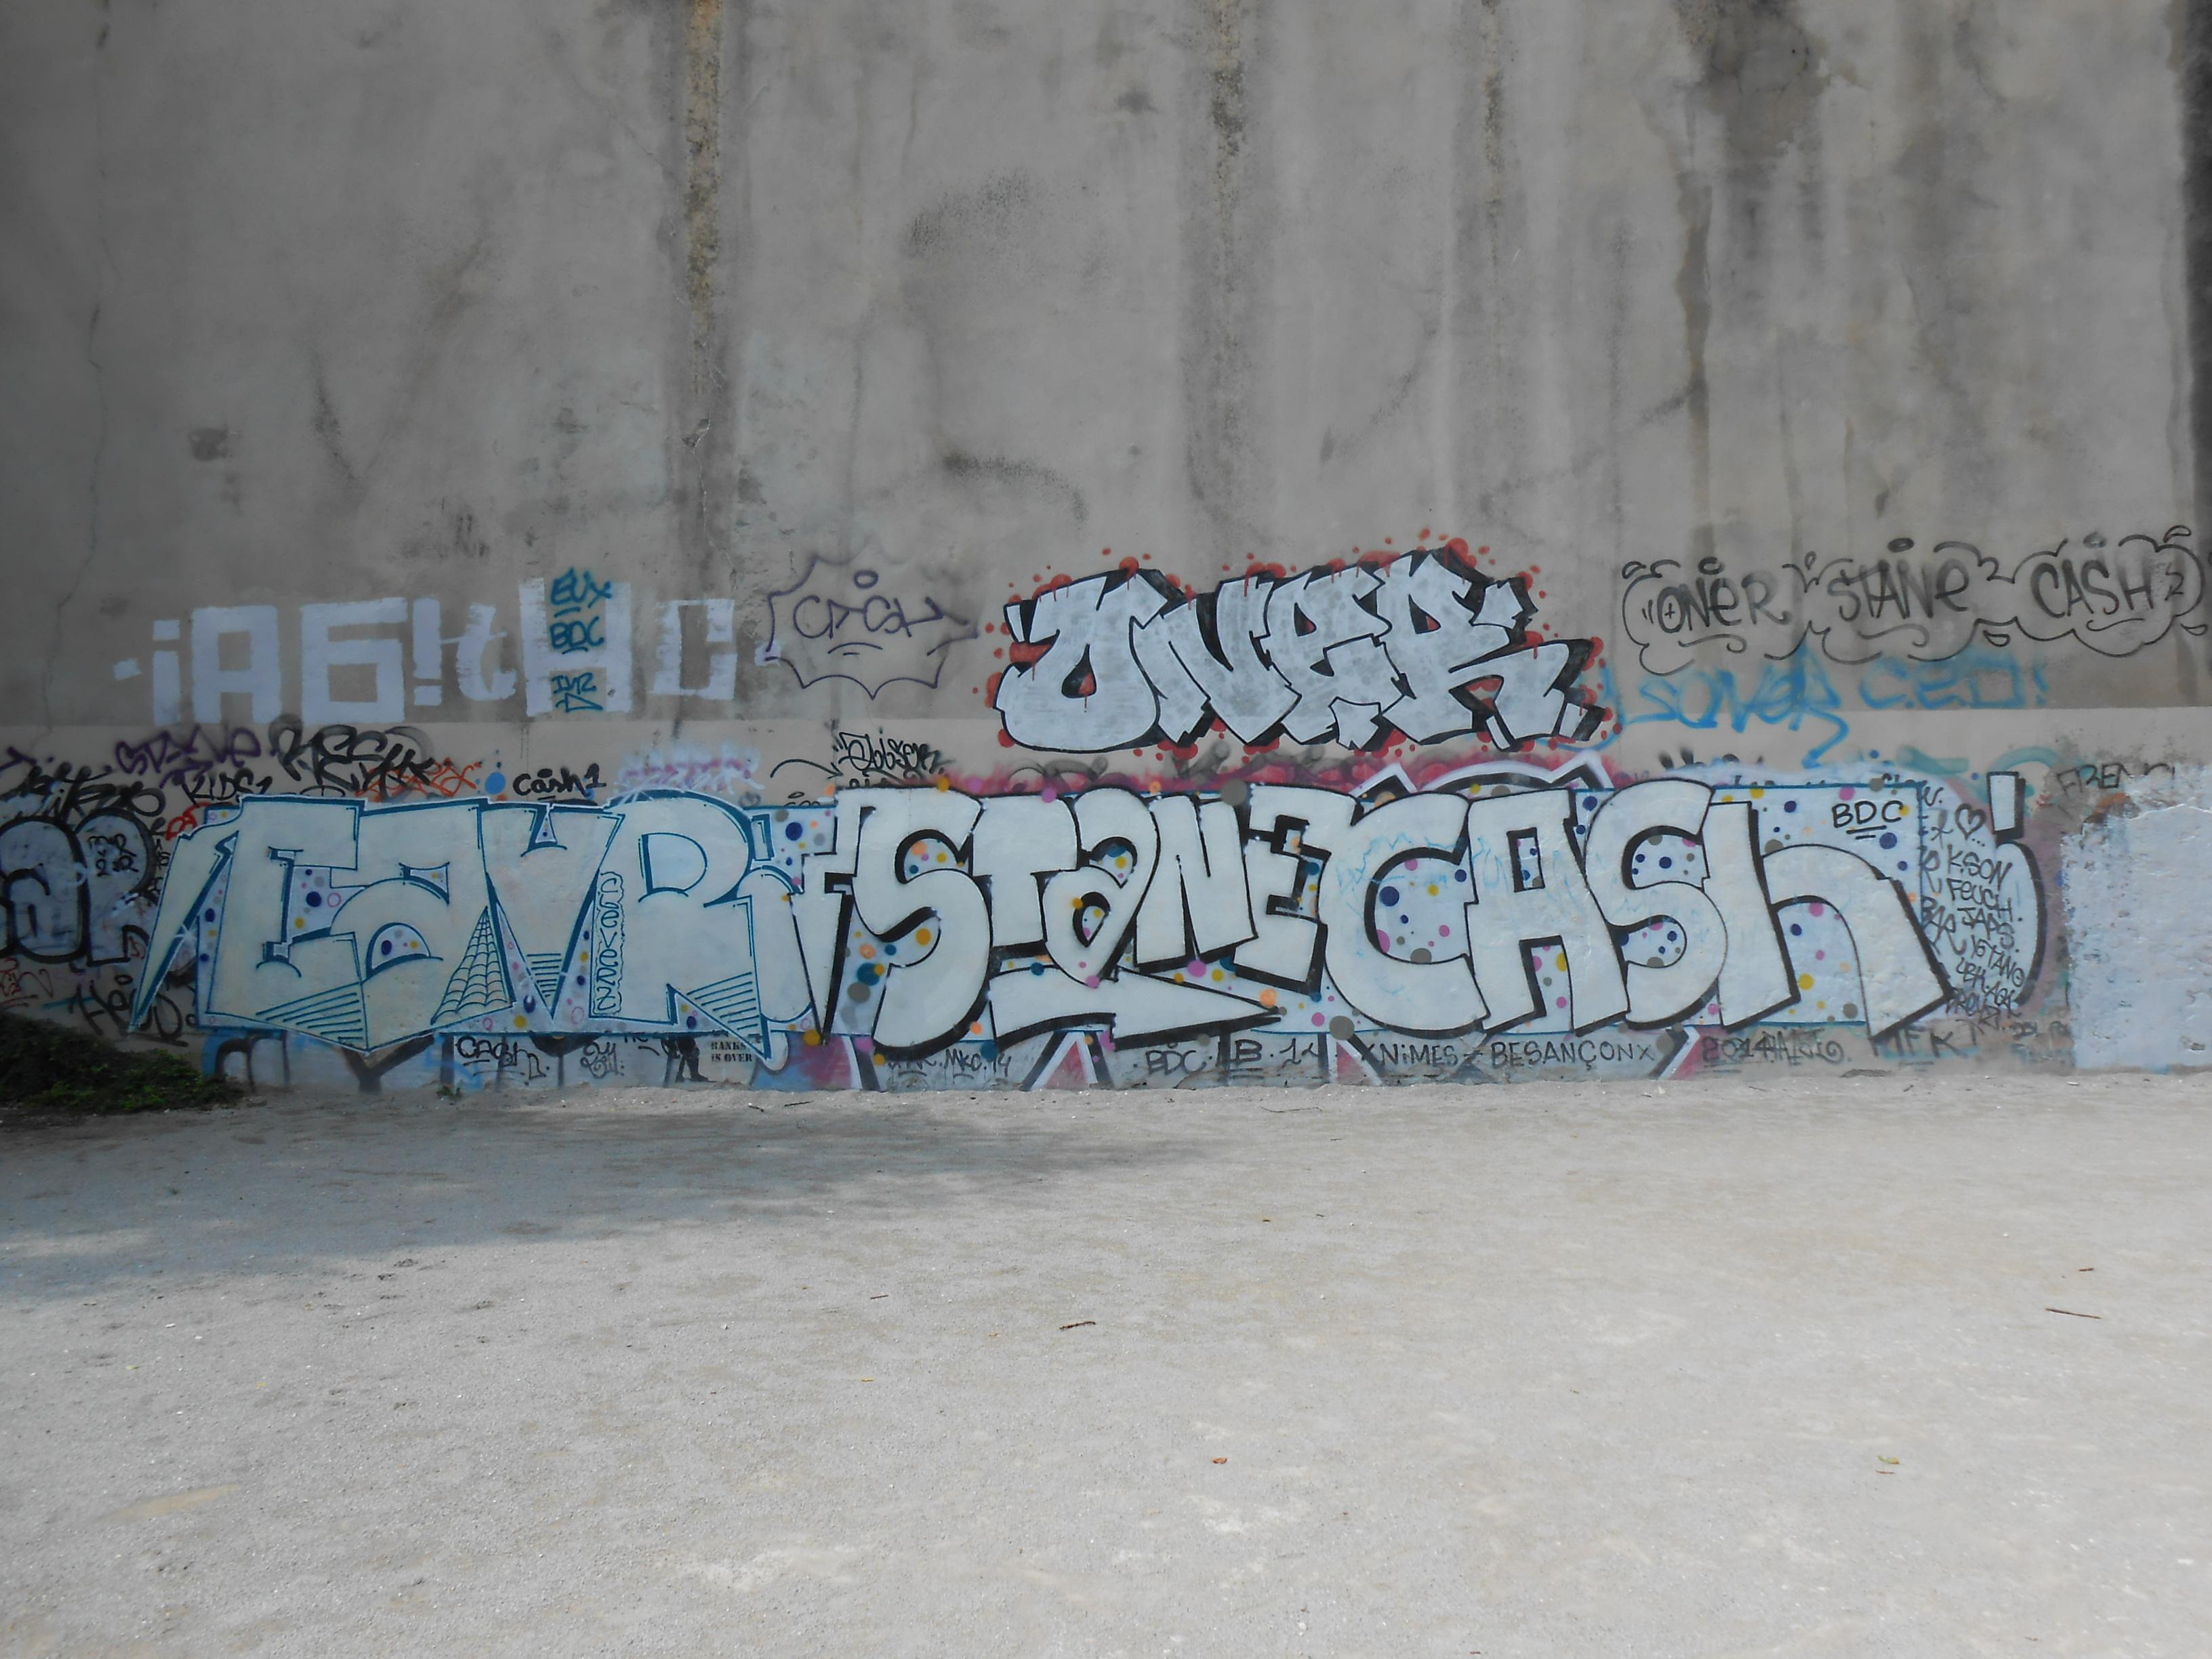 Eavr, Stane, Cash_graffiti_besancon_07.2014 (1)